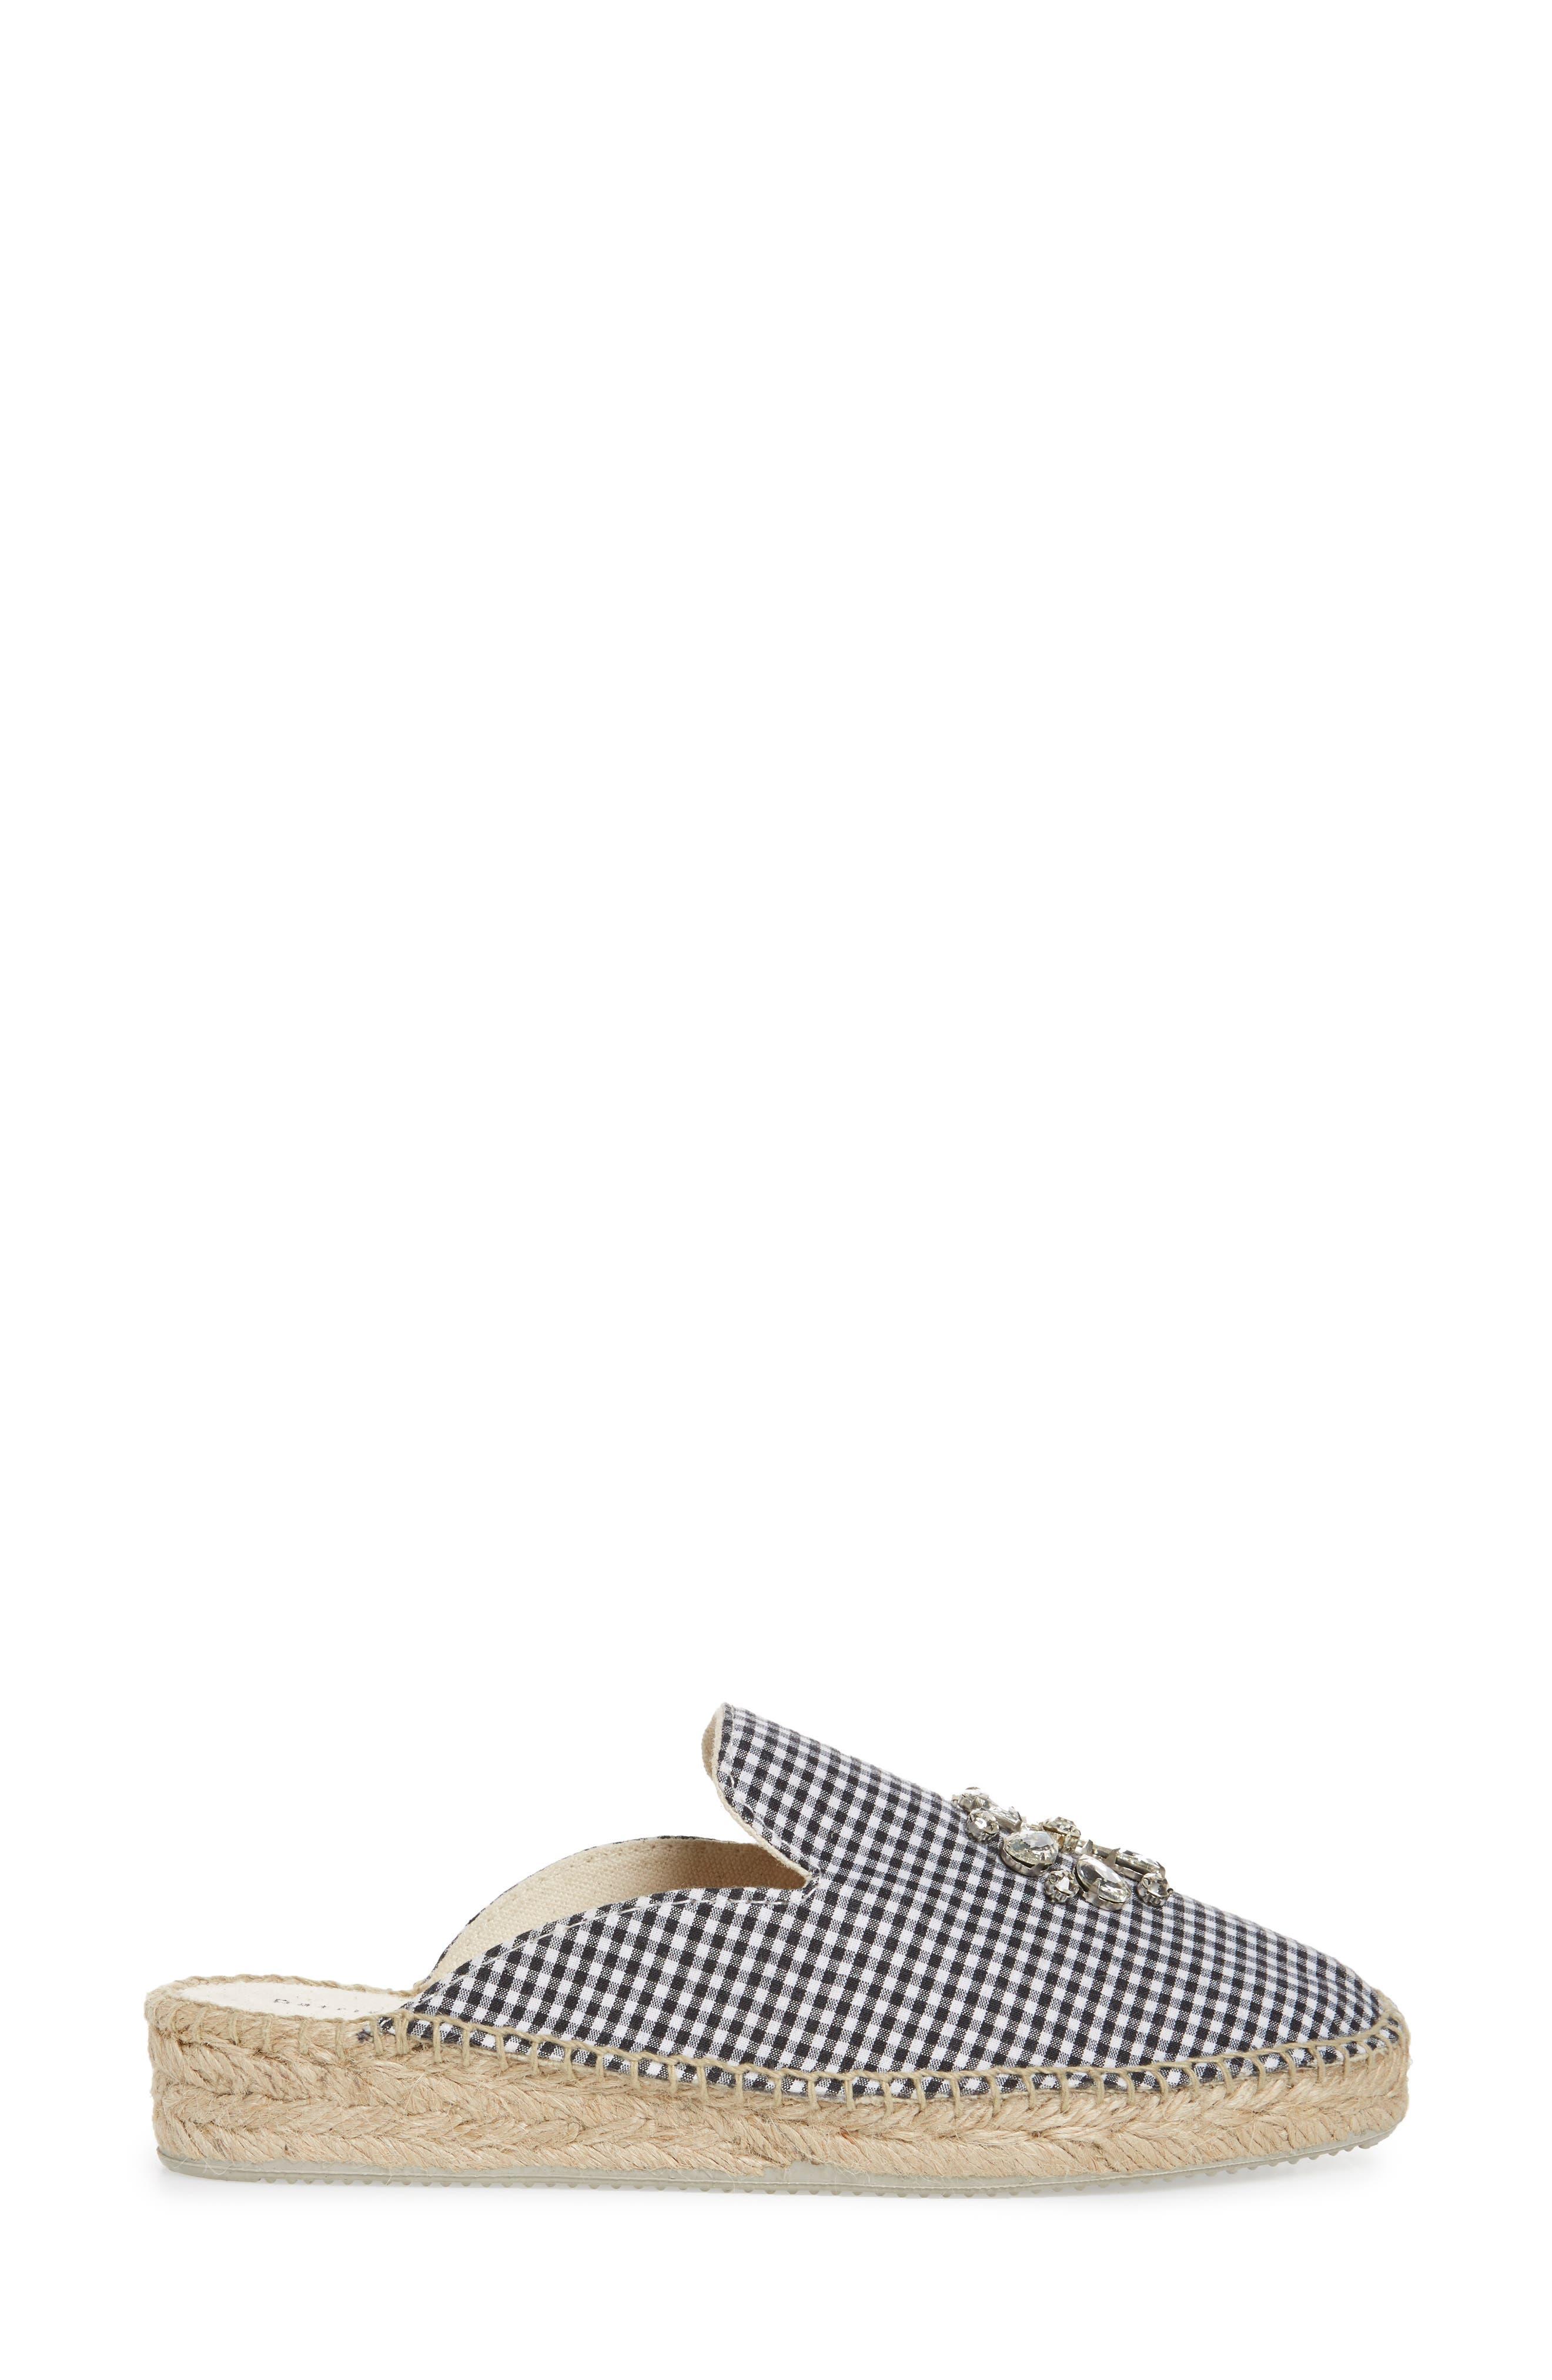 Gingham Glam Embellished Loafer Mule,                             Alternate thumbnail 3, color,                             BLACK FABRIC